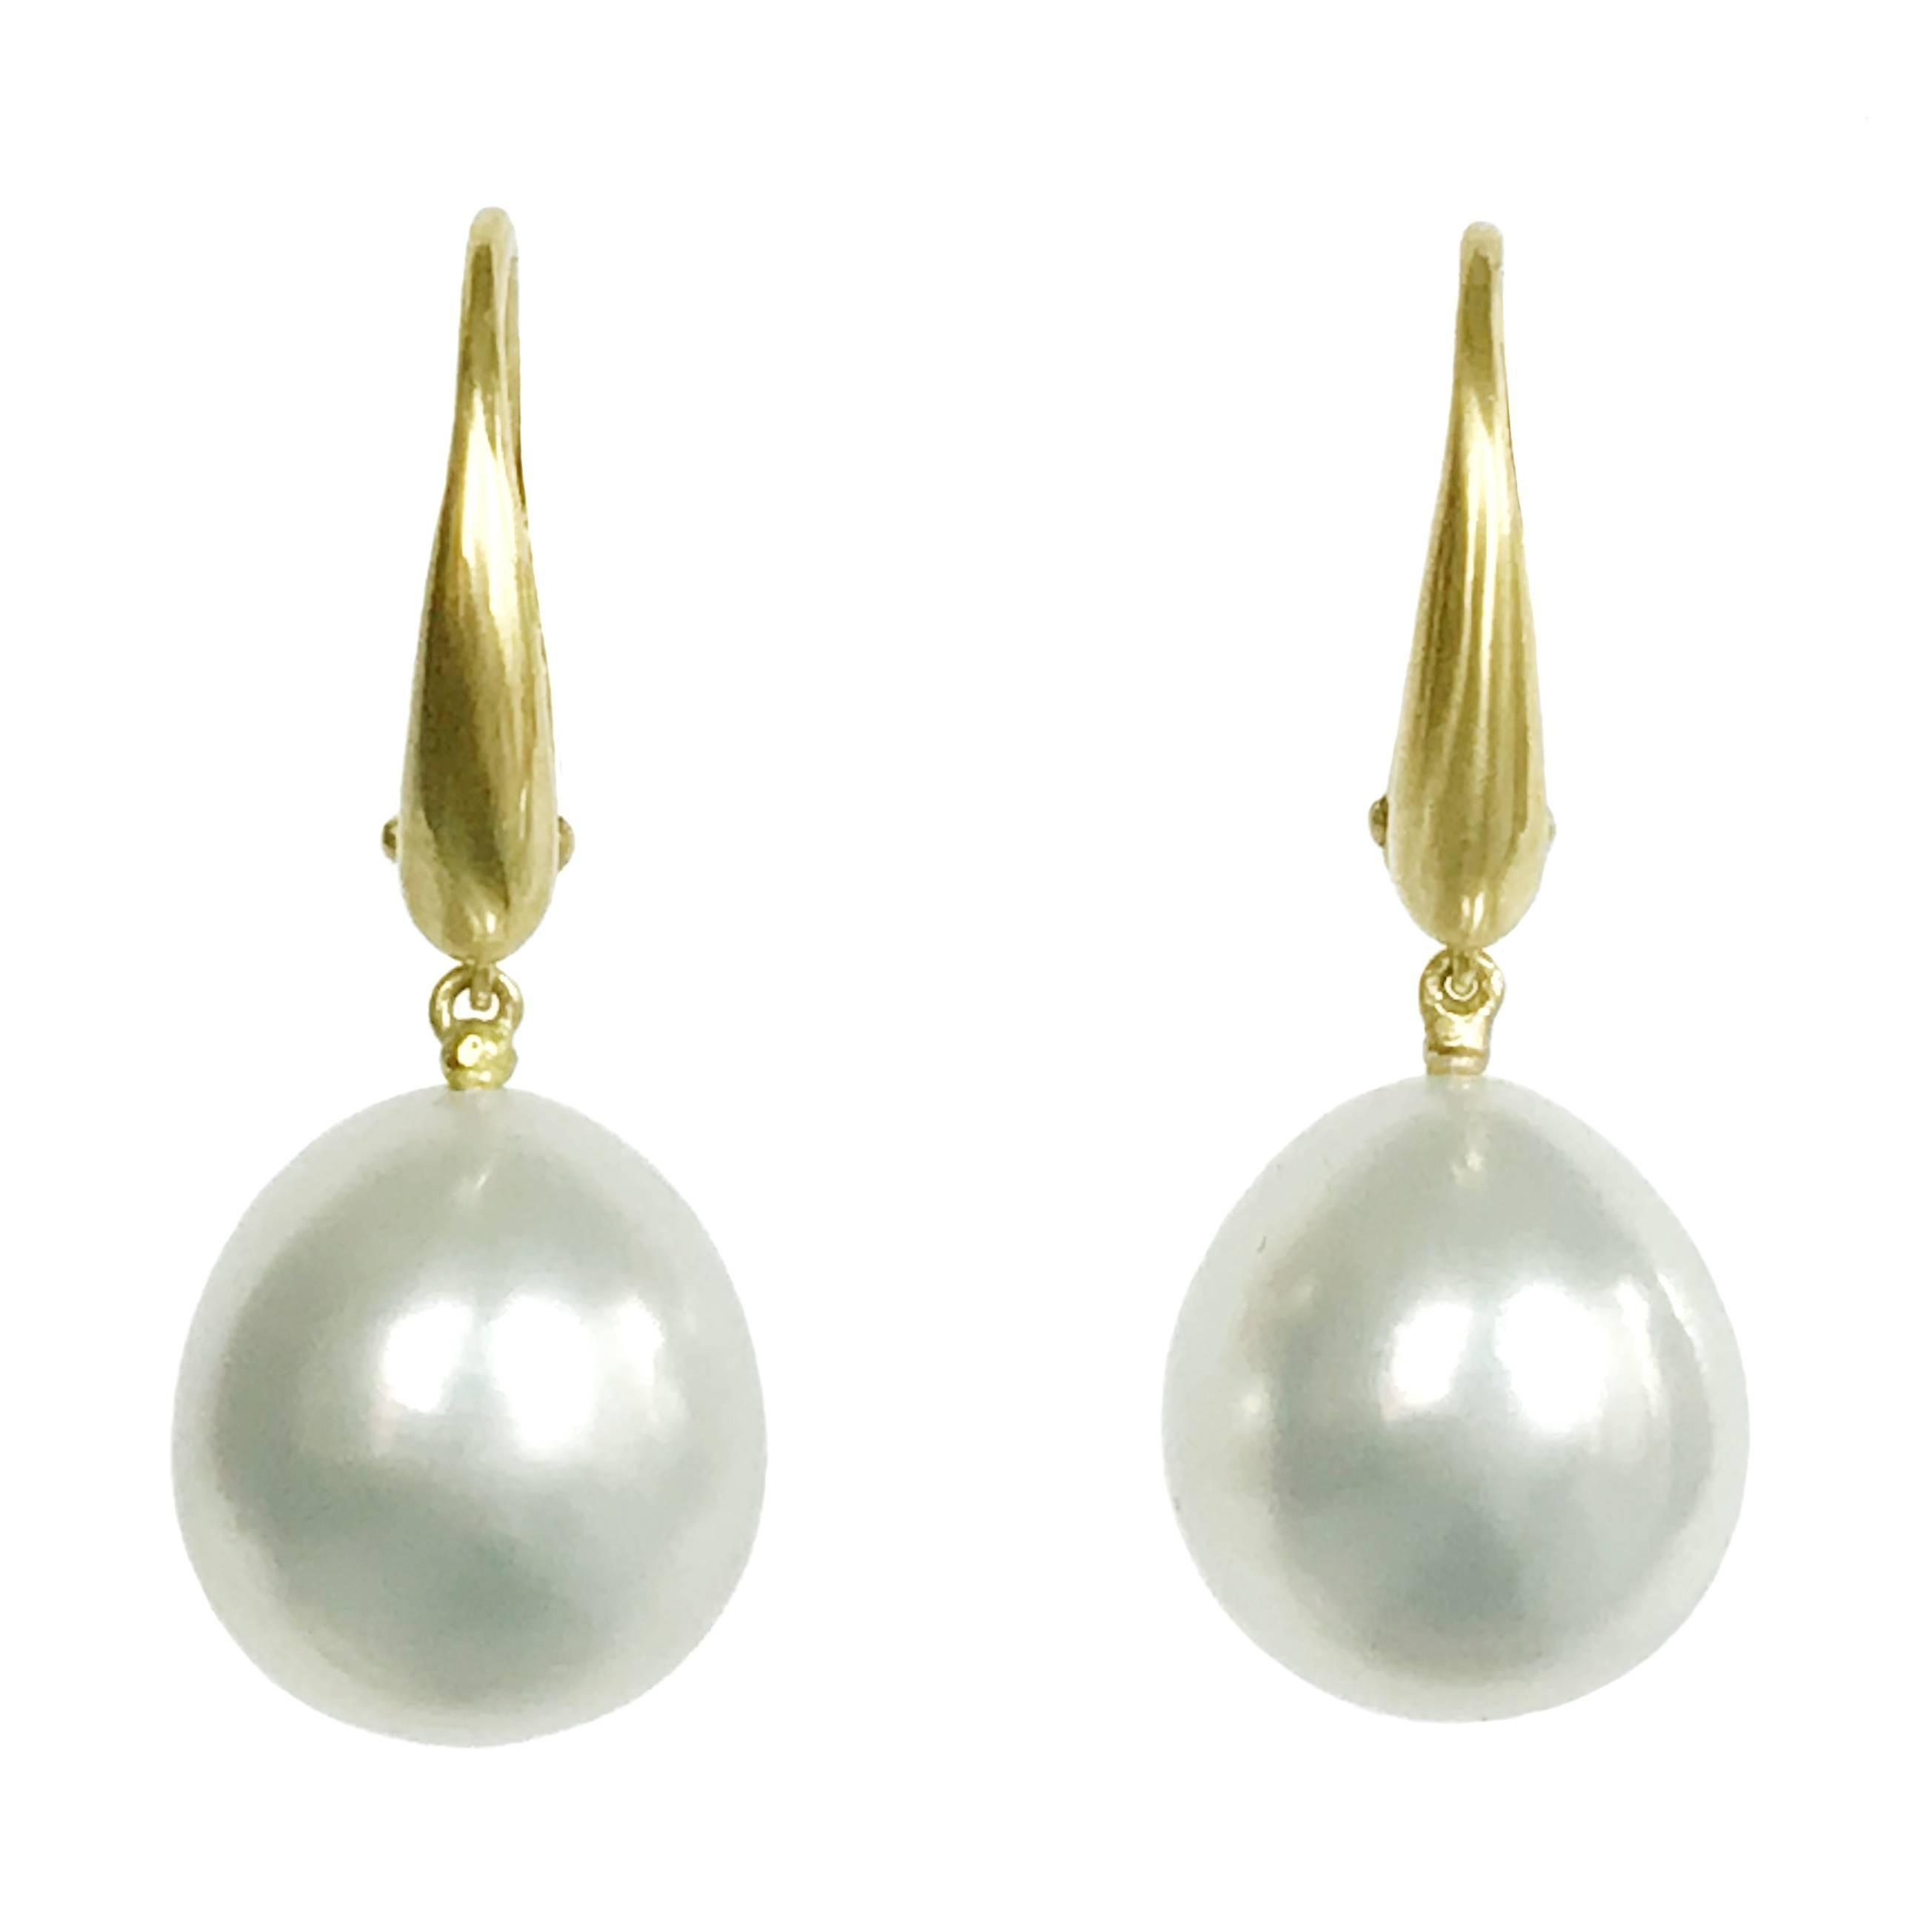 Dalben Design Australian South Sea Pearl Yellow Gold Dangle Earring